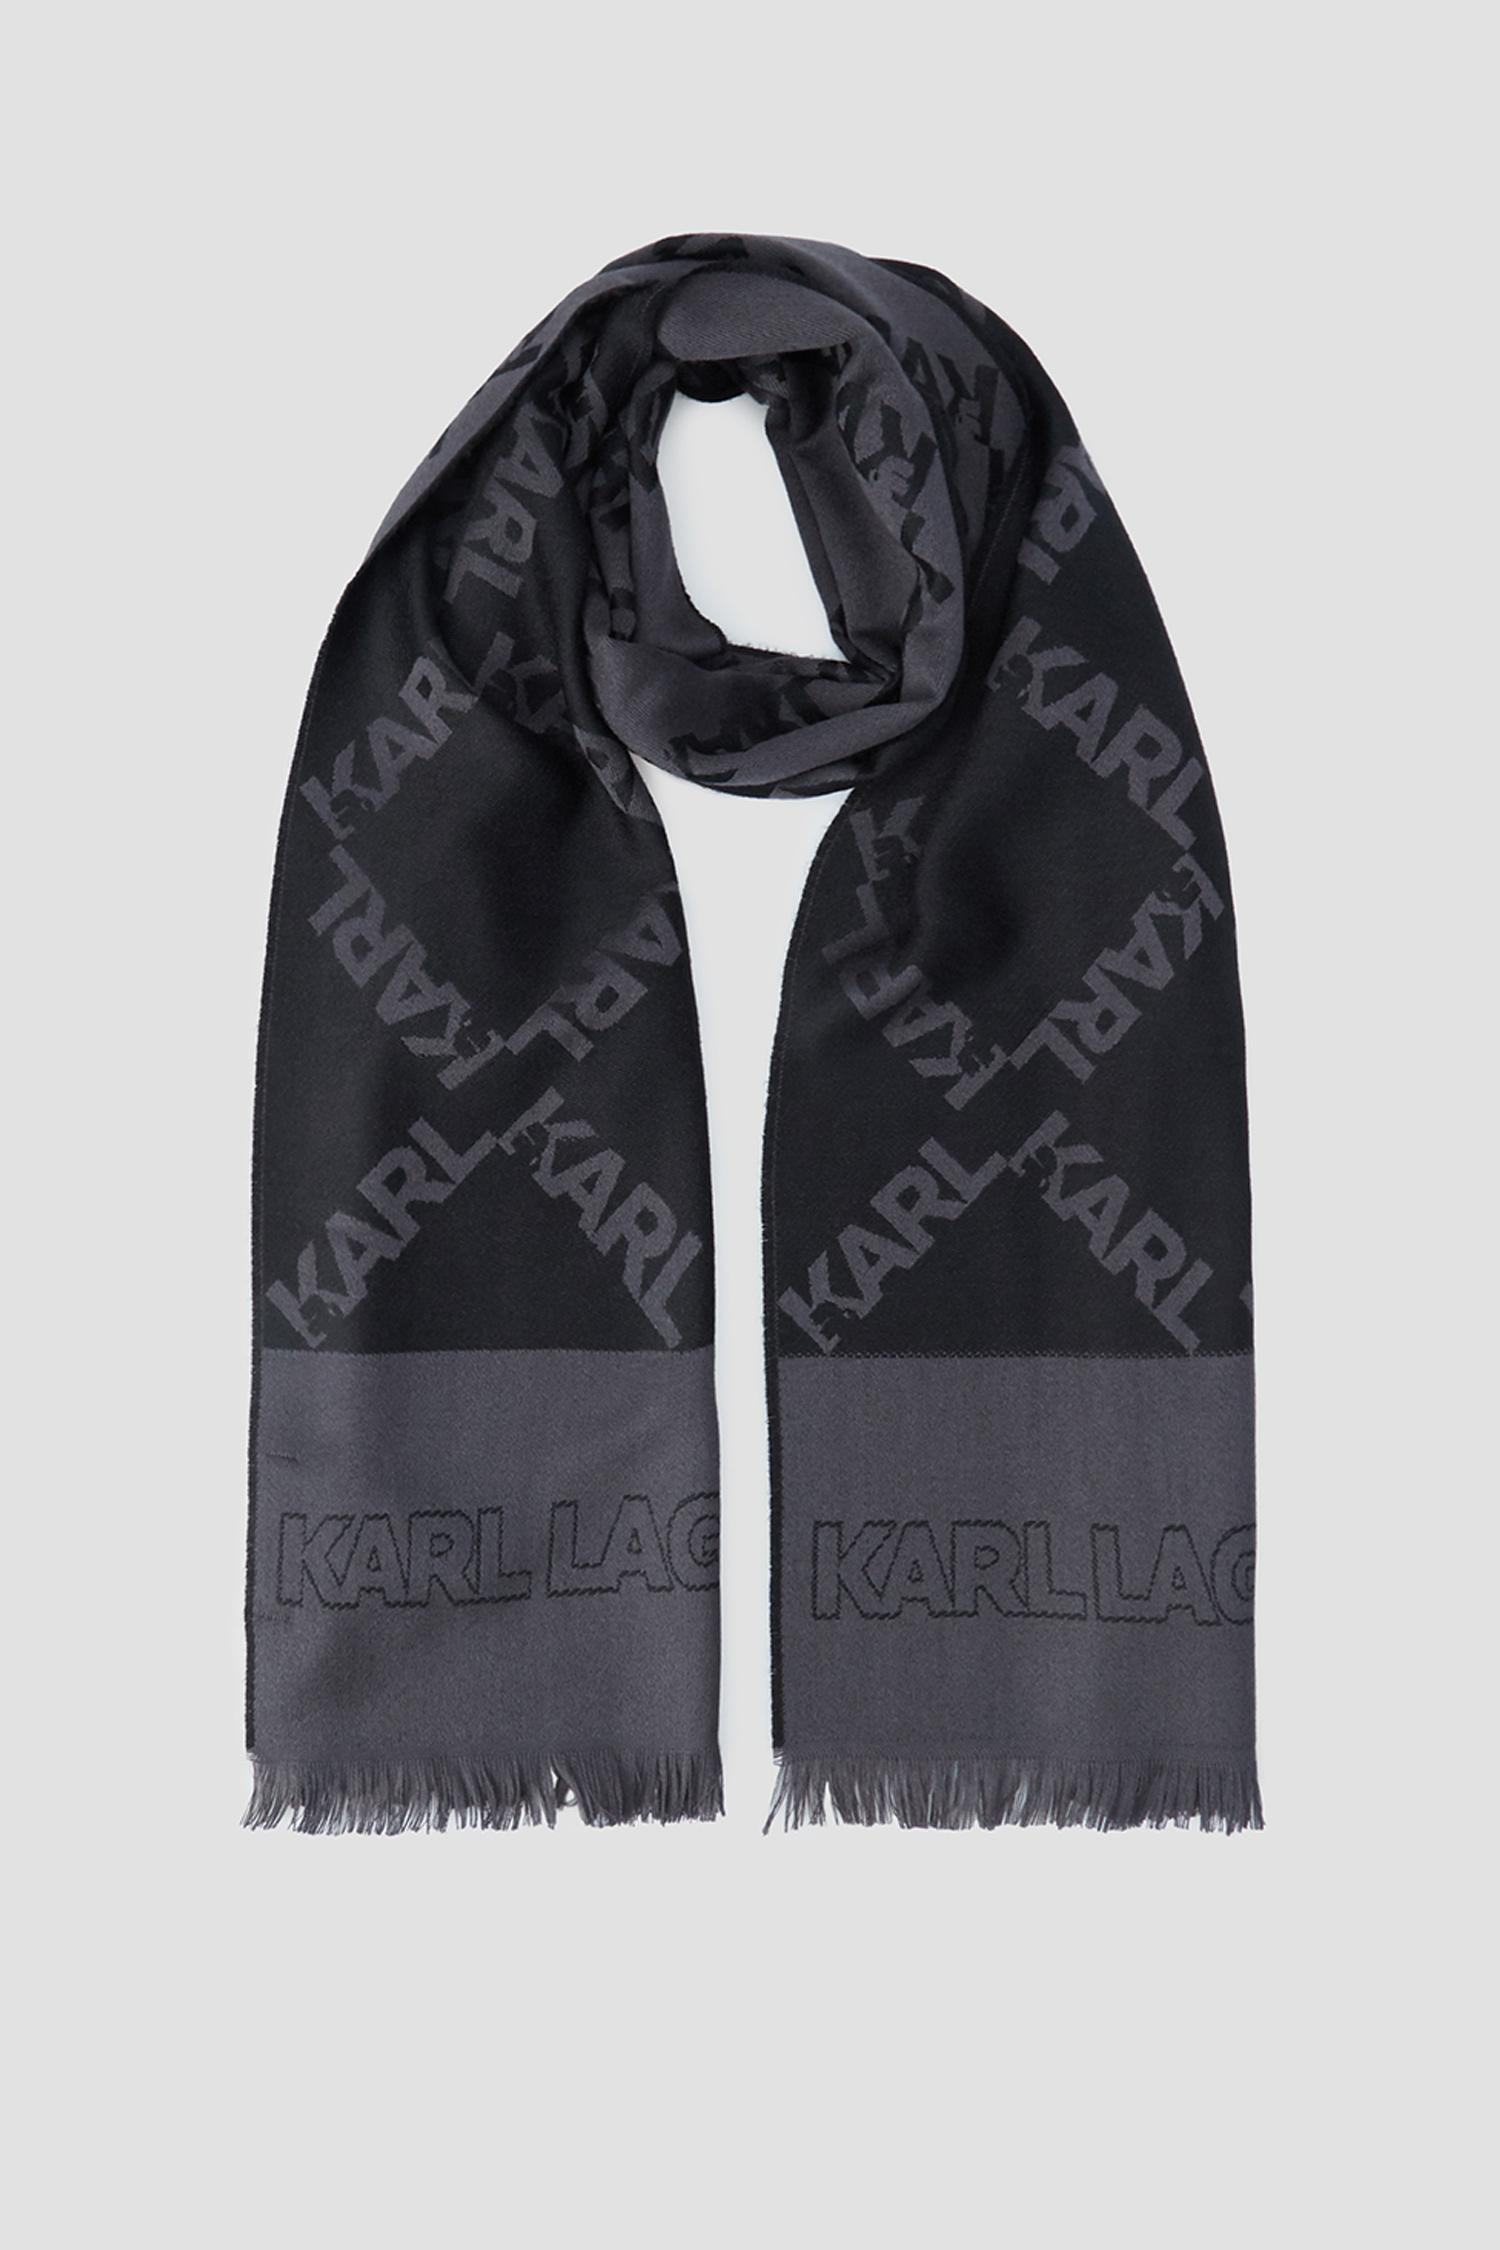 Мужской шерстяной шарф Karl Lagerfeld 502134.805001;270